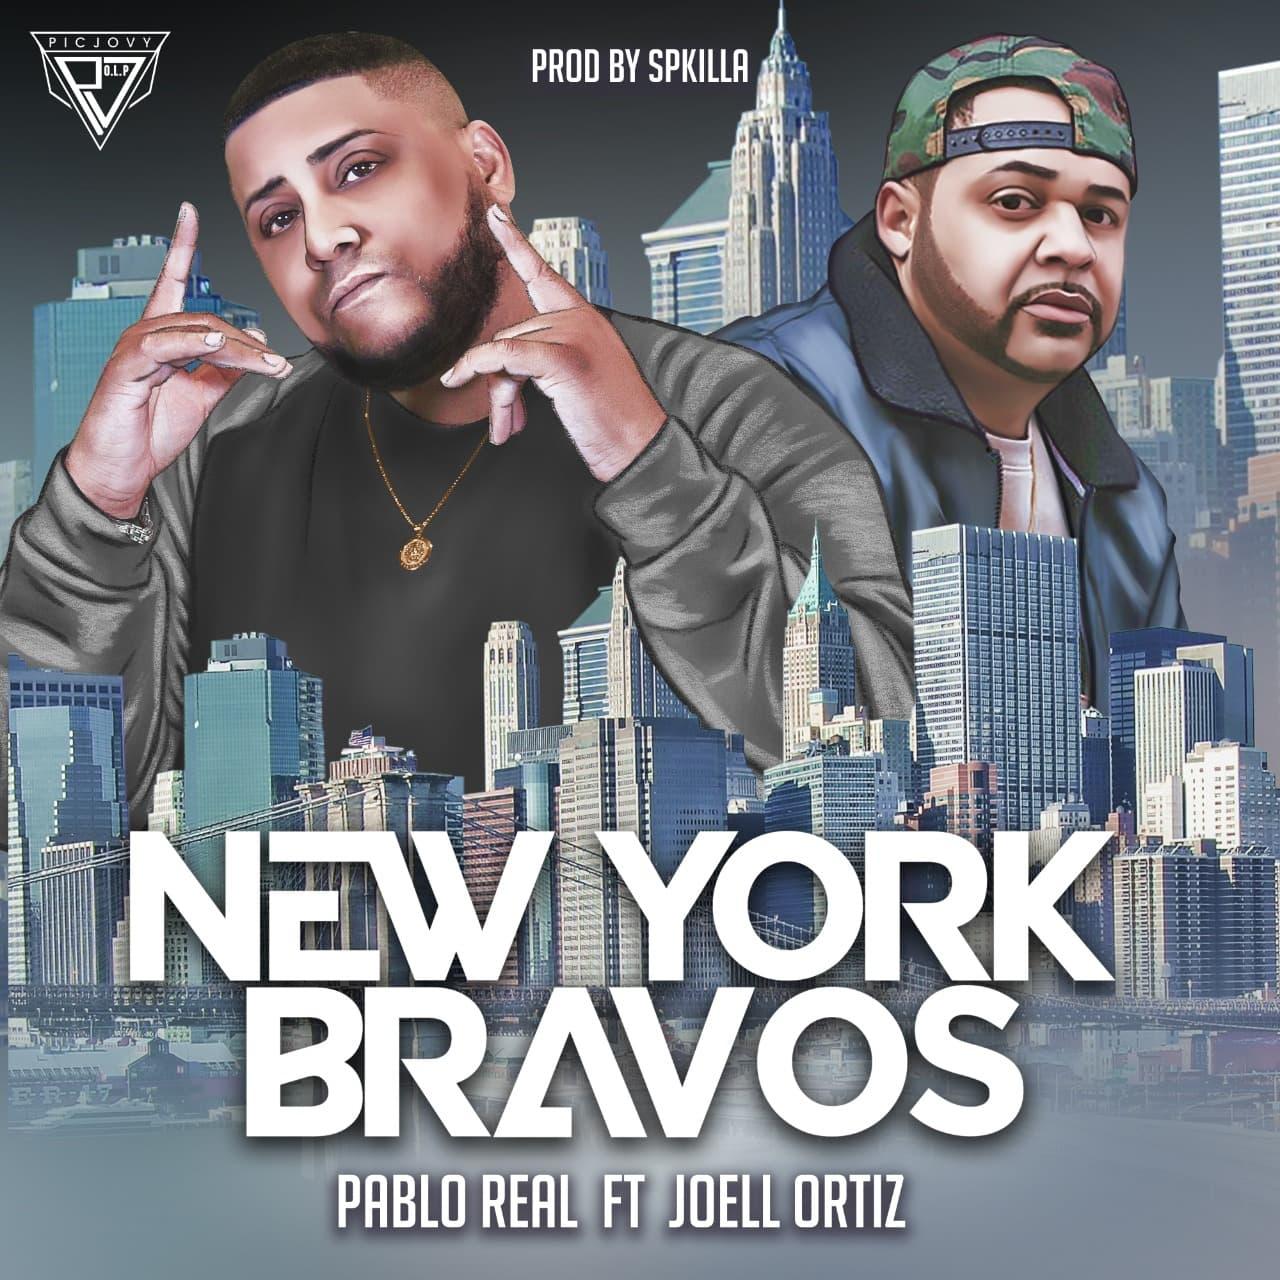 "122468611 2760527527521382 2901768905408422667 n - ""PABLO REAL Y JOELL ORTIZ"" SE PREPARAN PARA SOLTAR ""NEW YORK BRAVOS"""